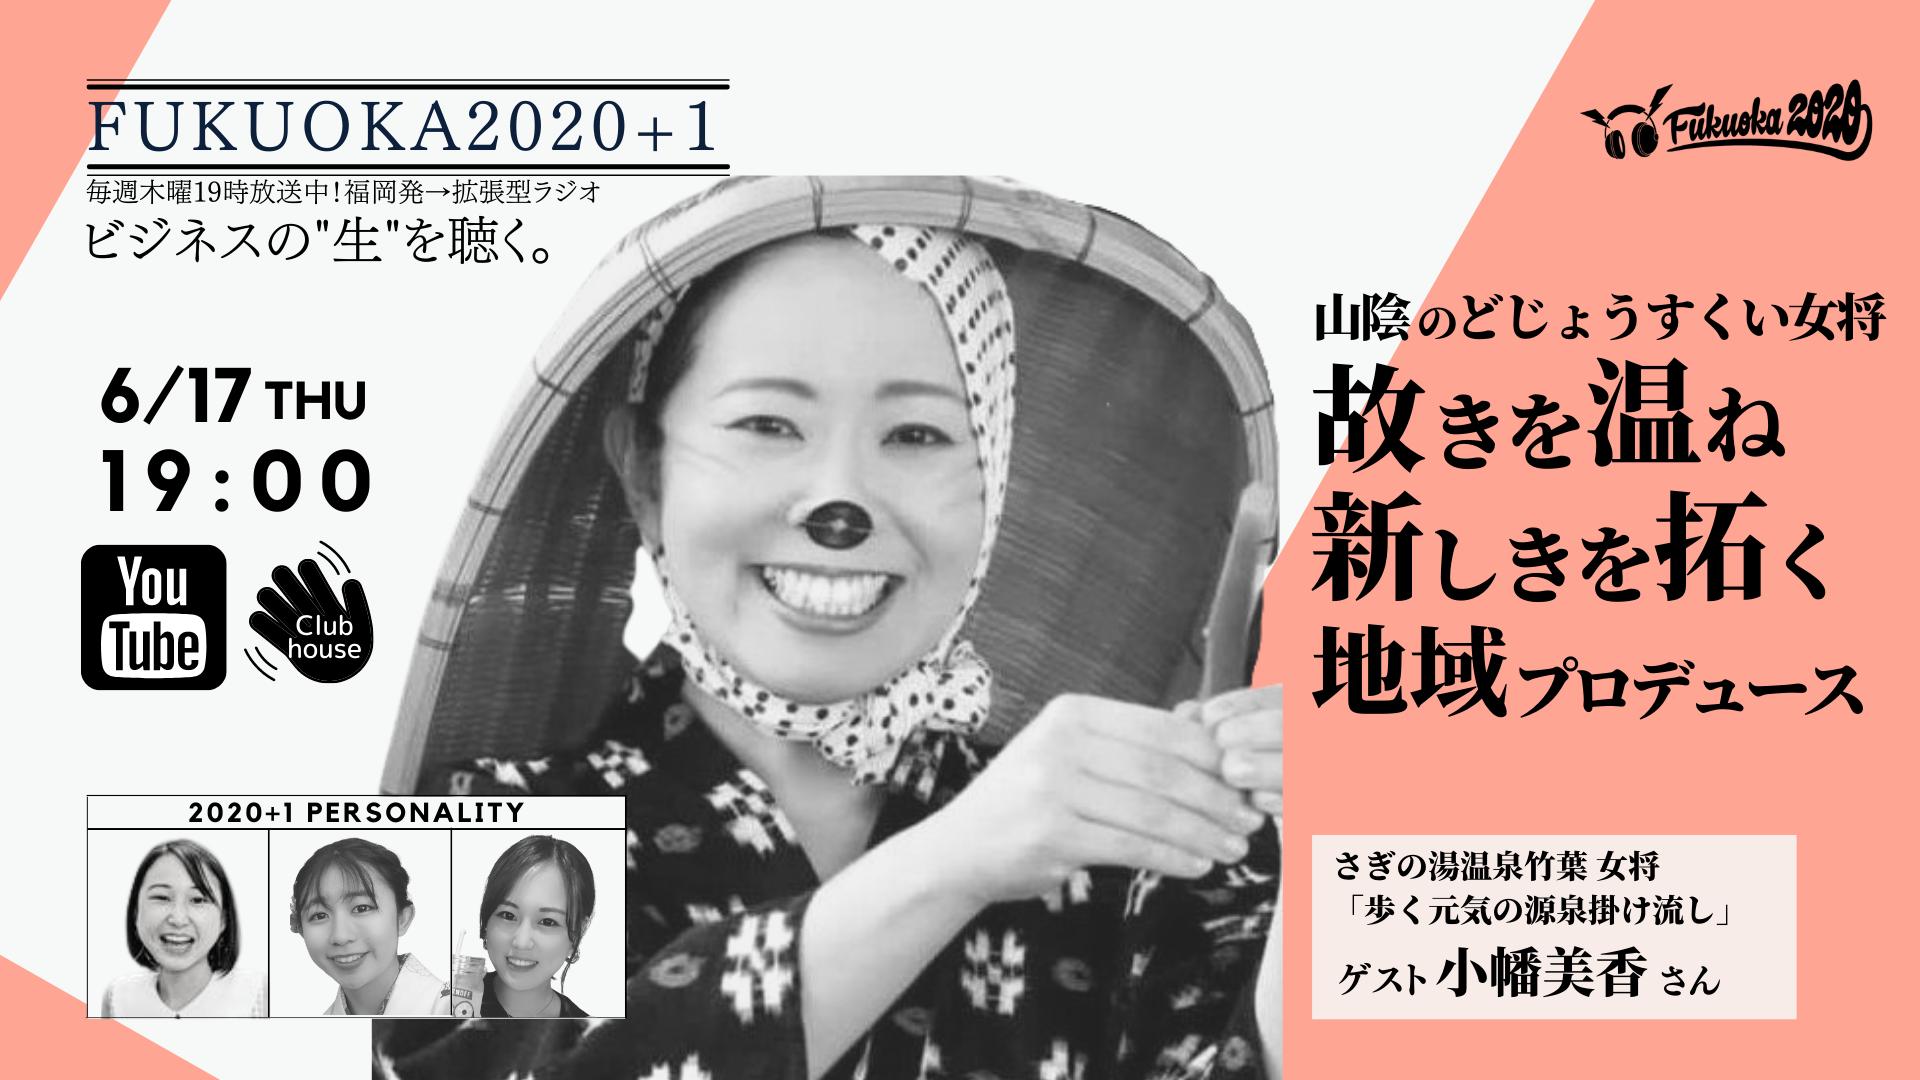 【LIVE】FUKUOKA2020 vol.142 ゲスト:山陰どじょうすくい女将 小幡美香さん